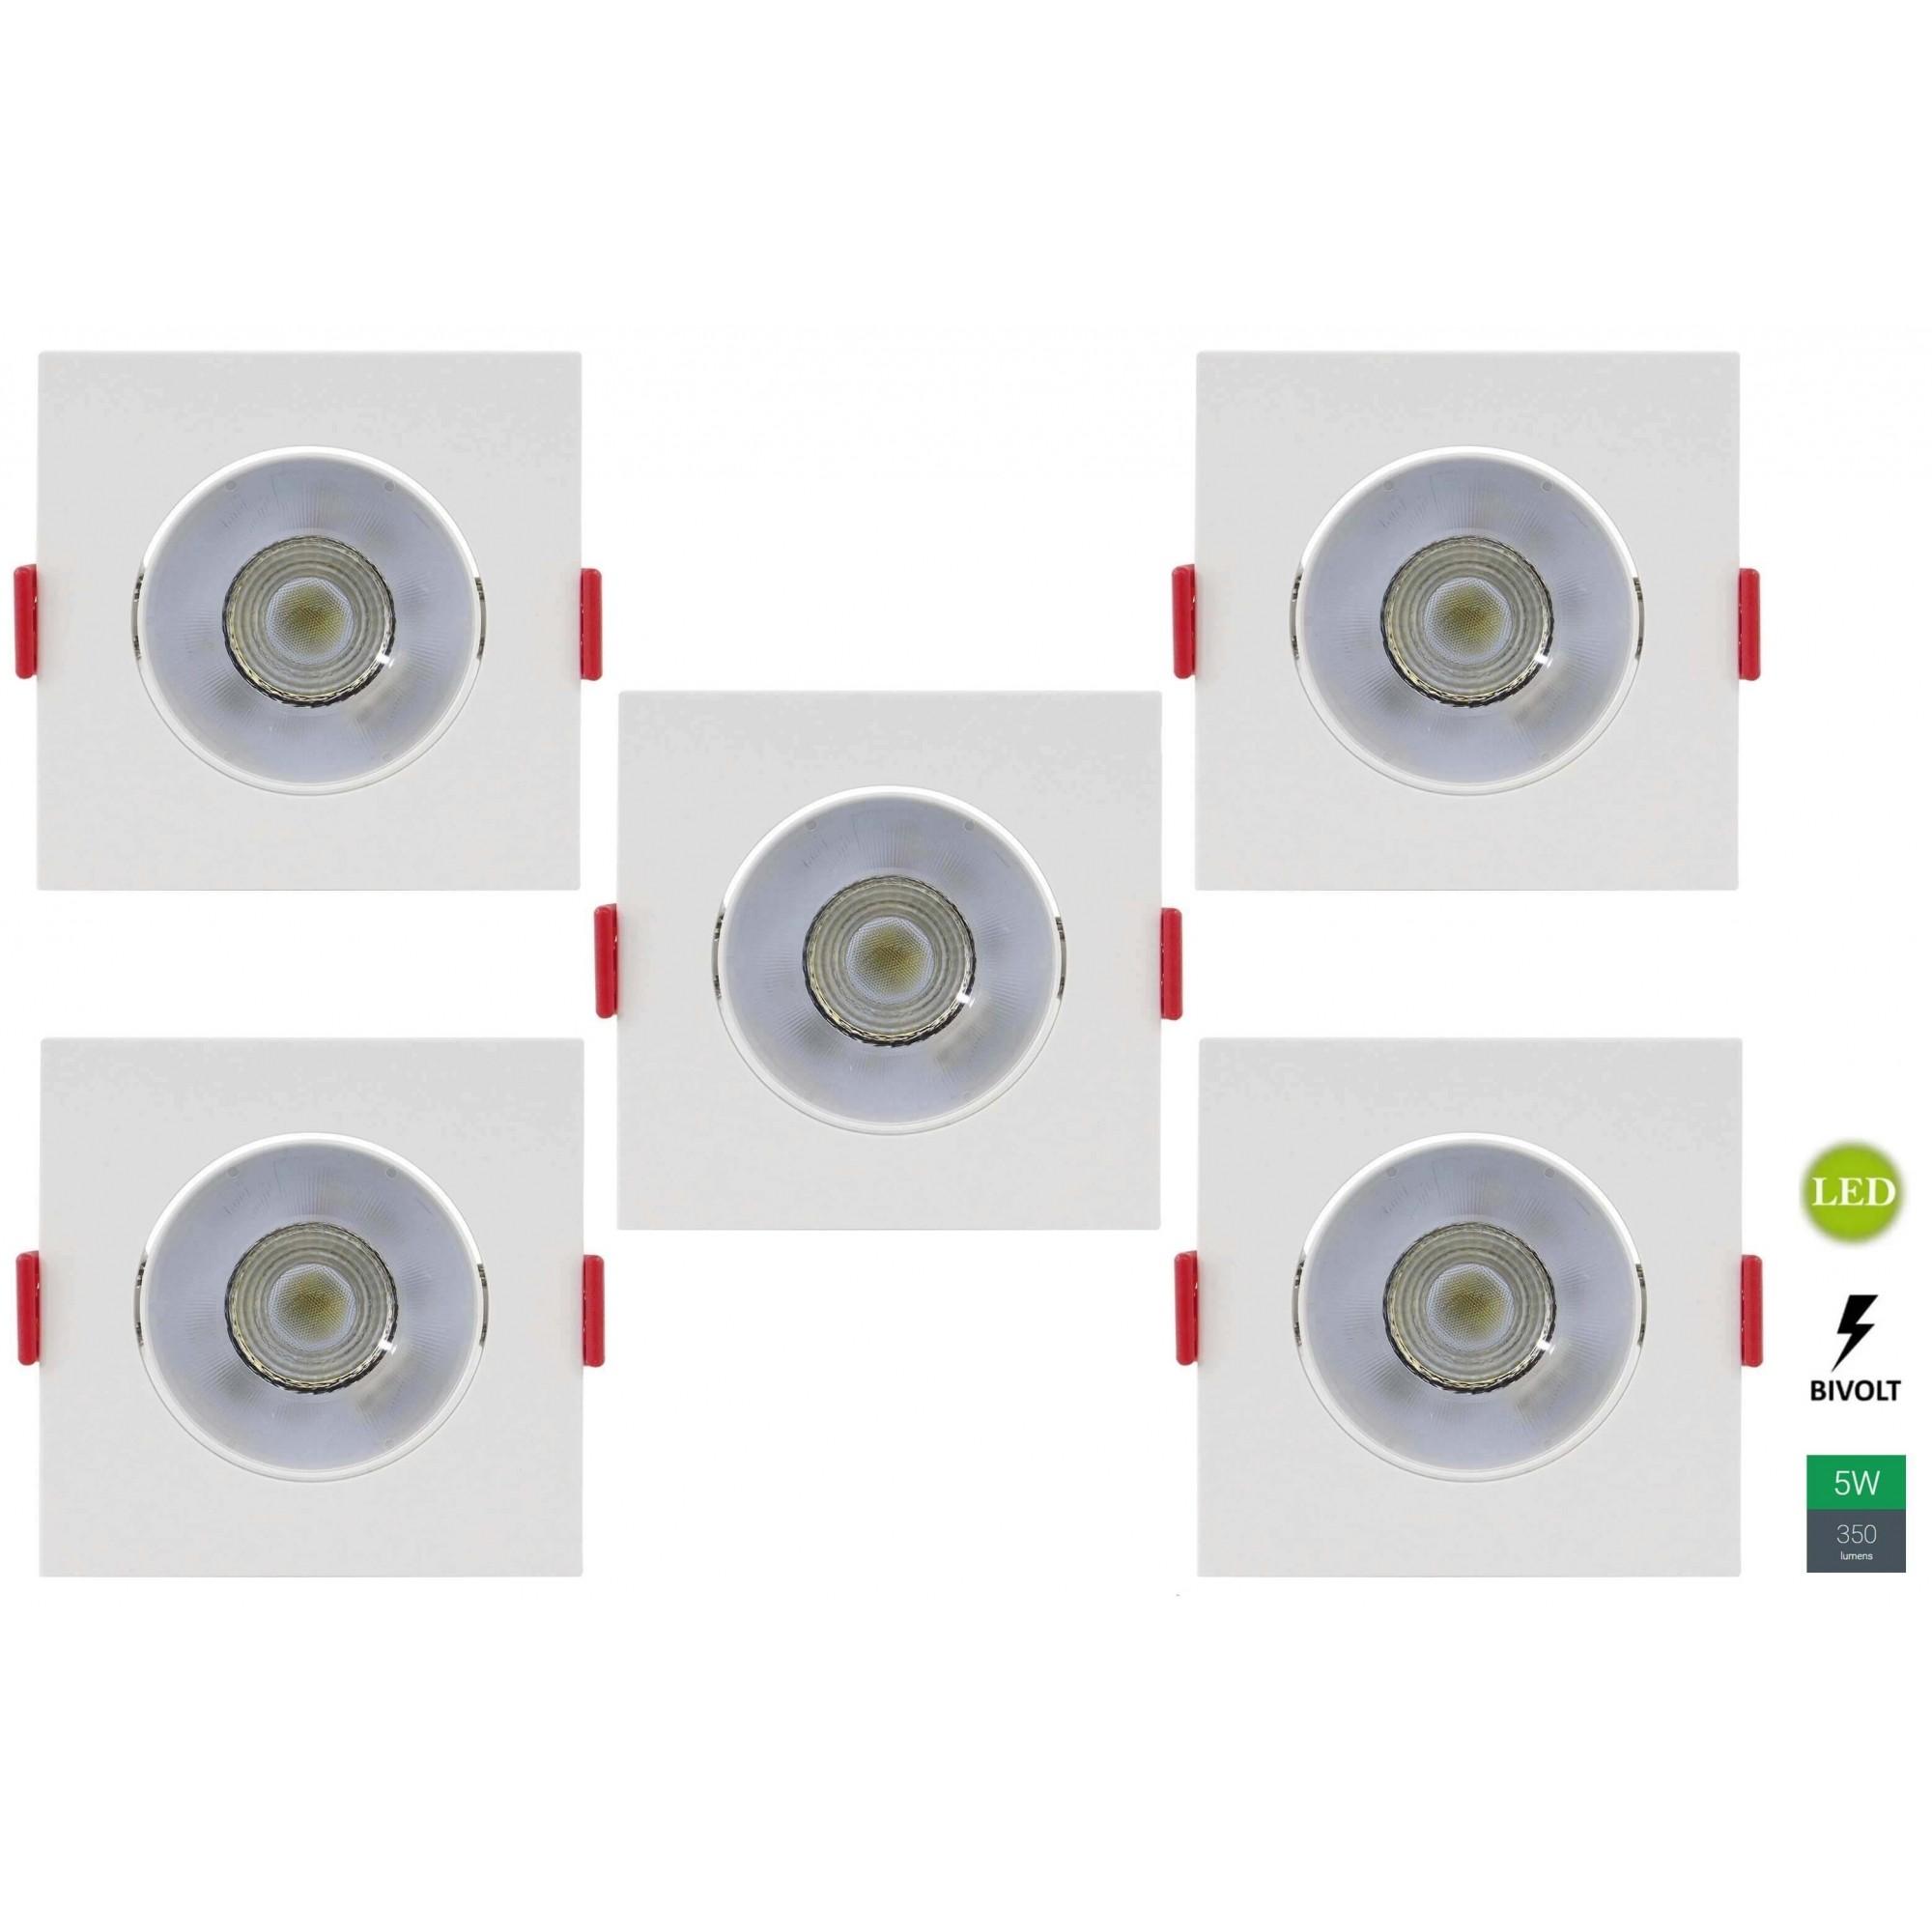 Kit 5 Spots Embutir 5w Quadrado Branco Quente